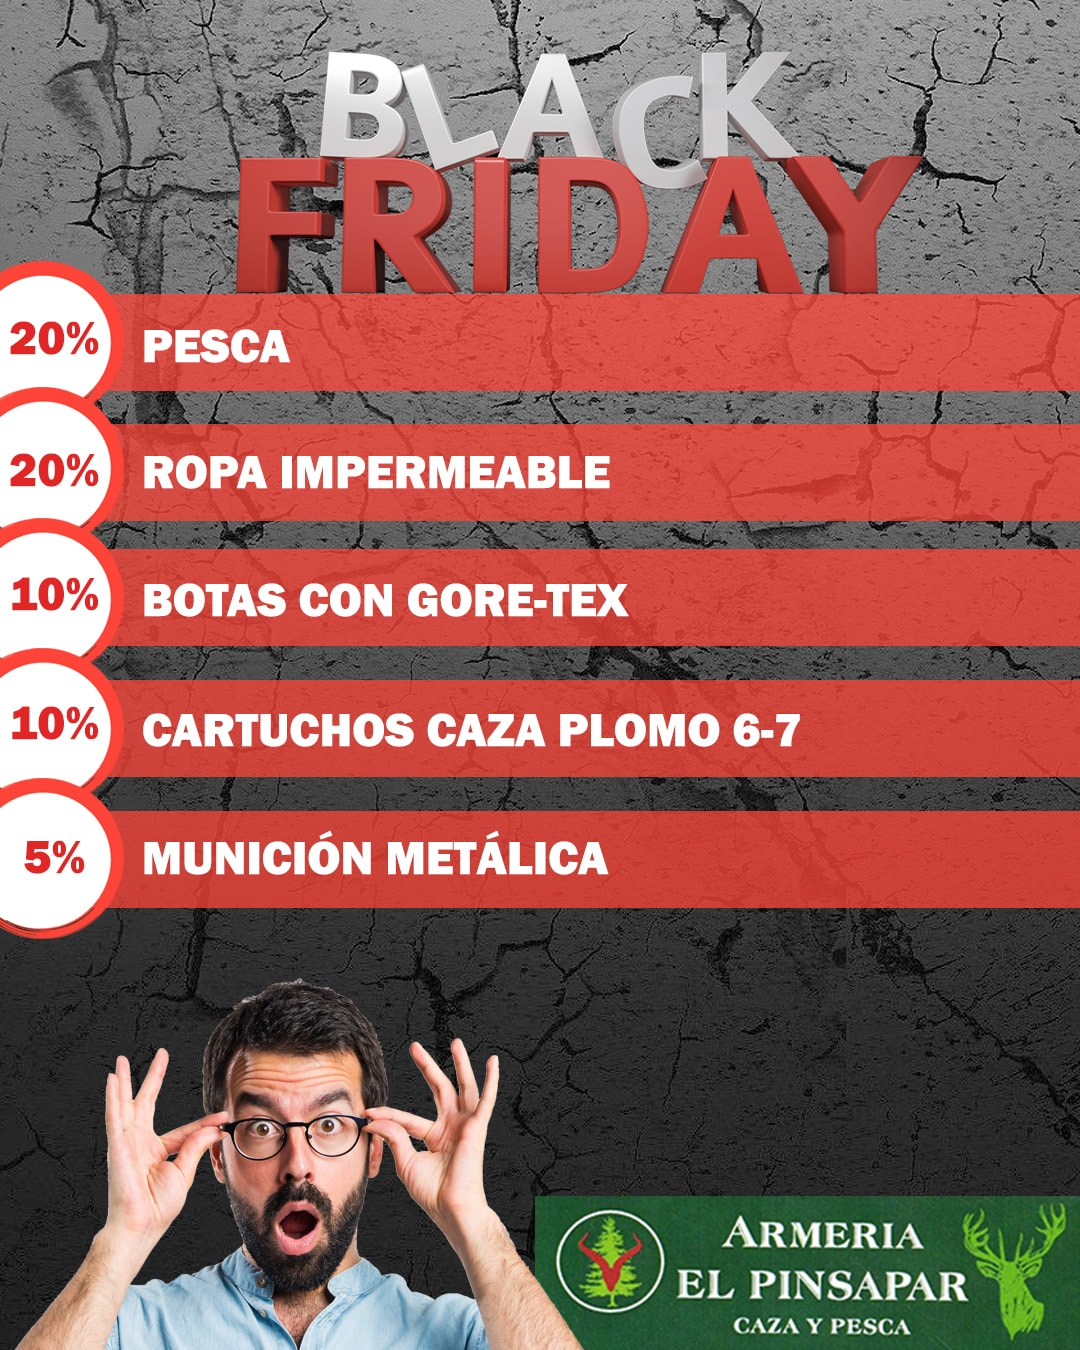 Black Friday Armeria El Pinsapar